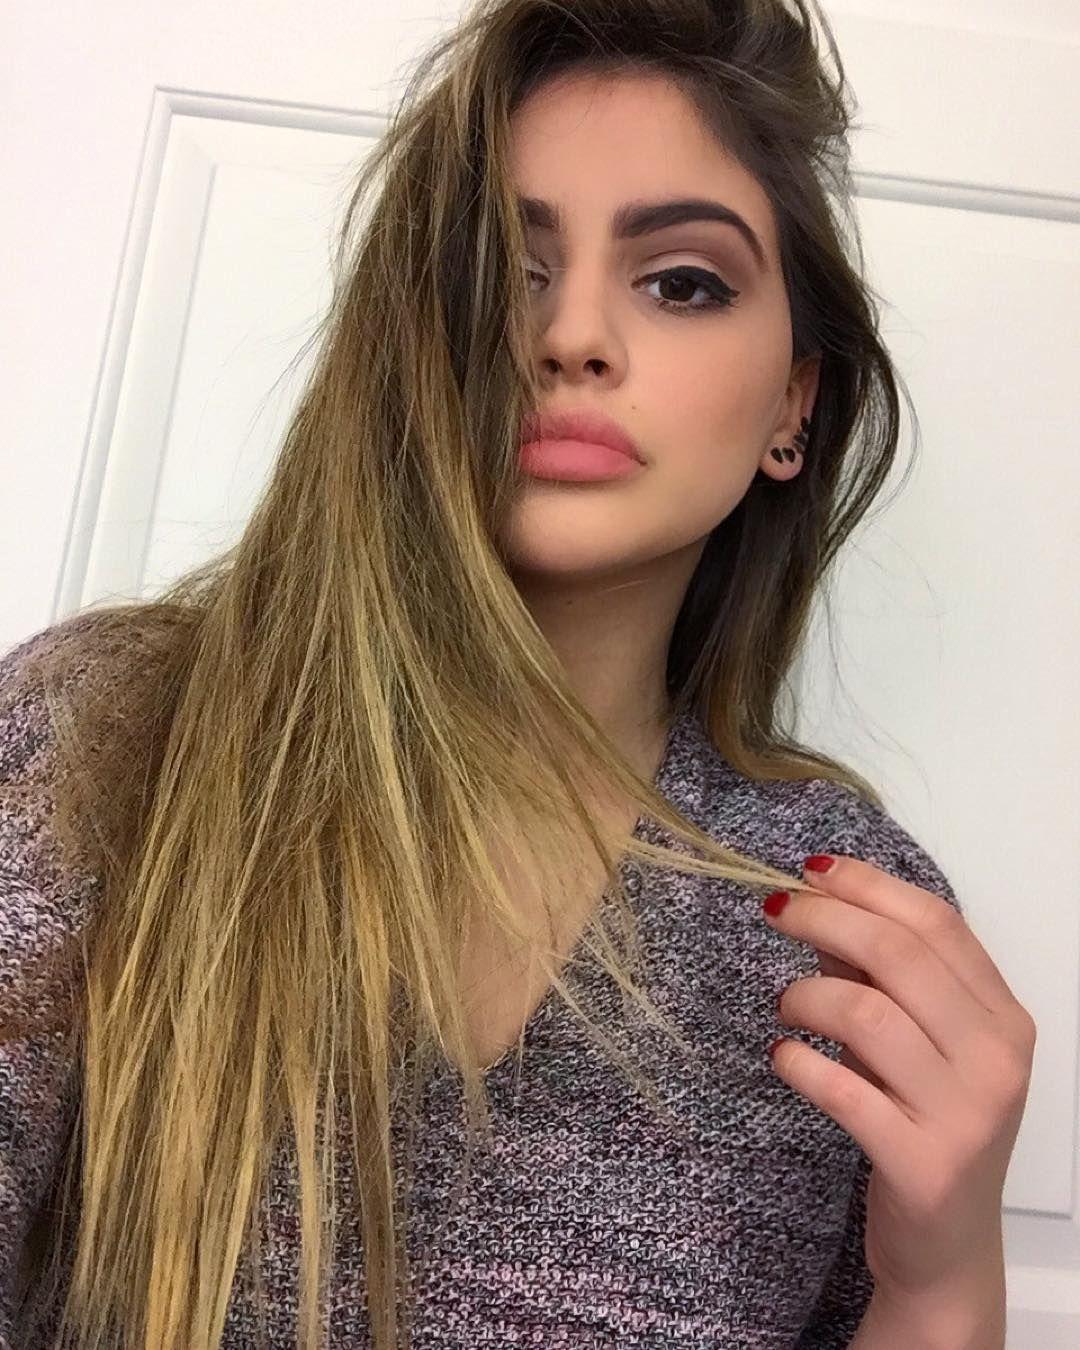 Selfie Maria Fernanda ?Chachi Telesco nude photos 2019